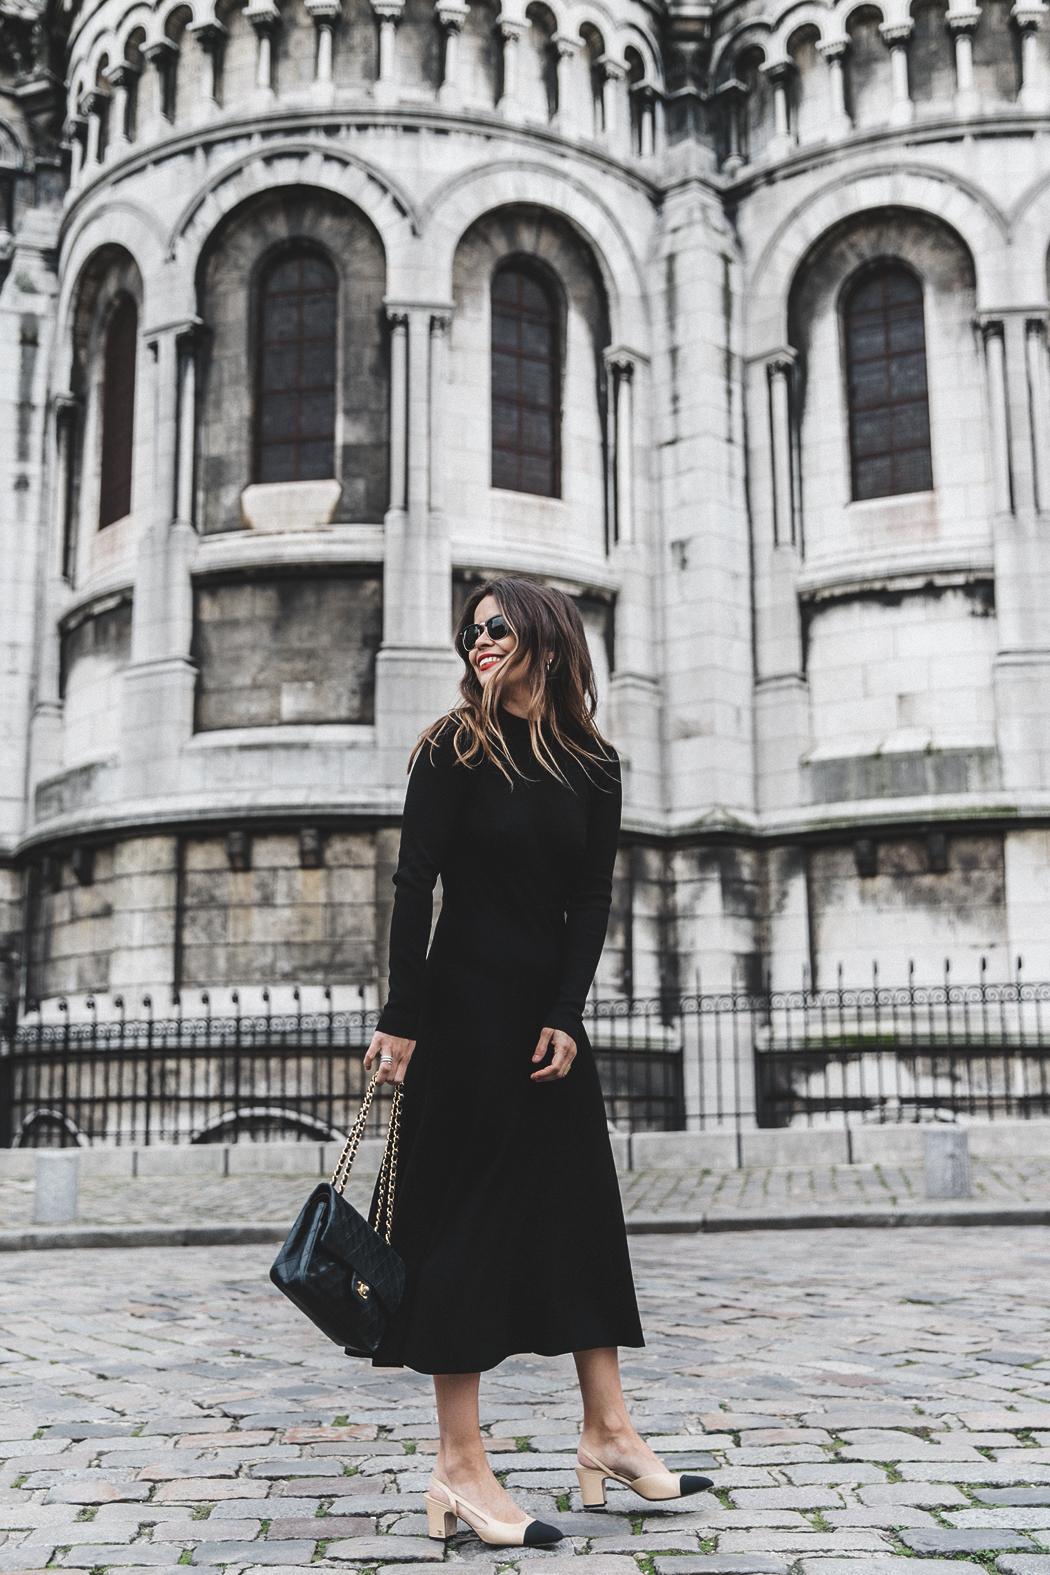 Backless_Dress-Black_Dress-Chanel_Shoes-Paris-PFW-Paris_Fashion_Week_Fall_2016-55